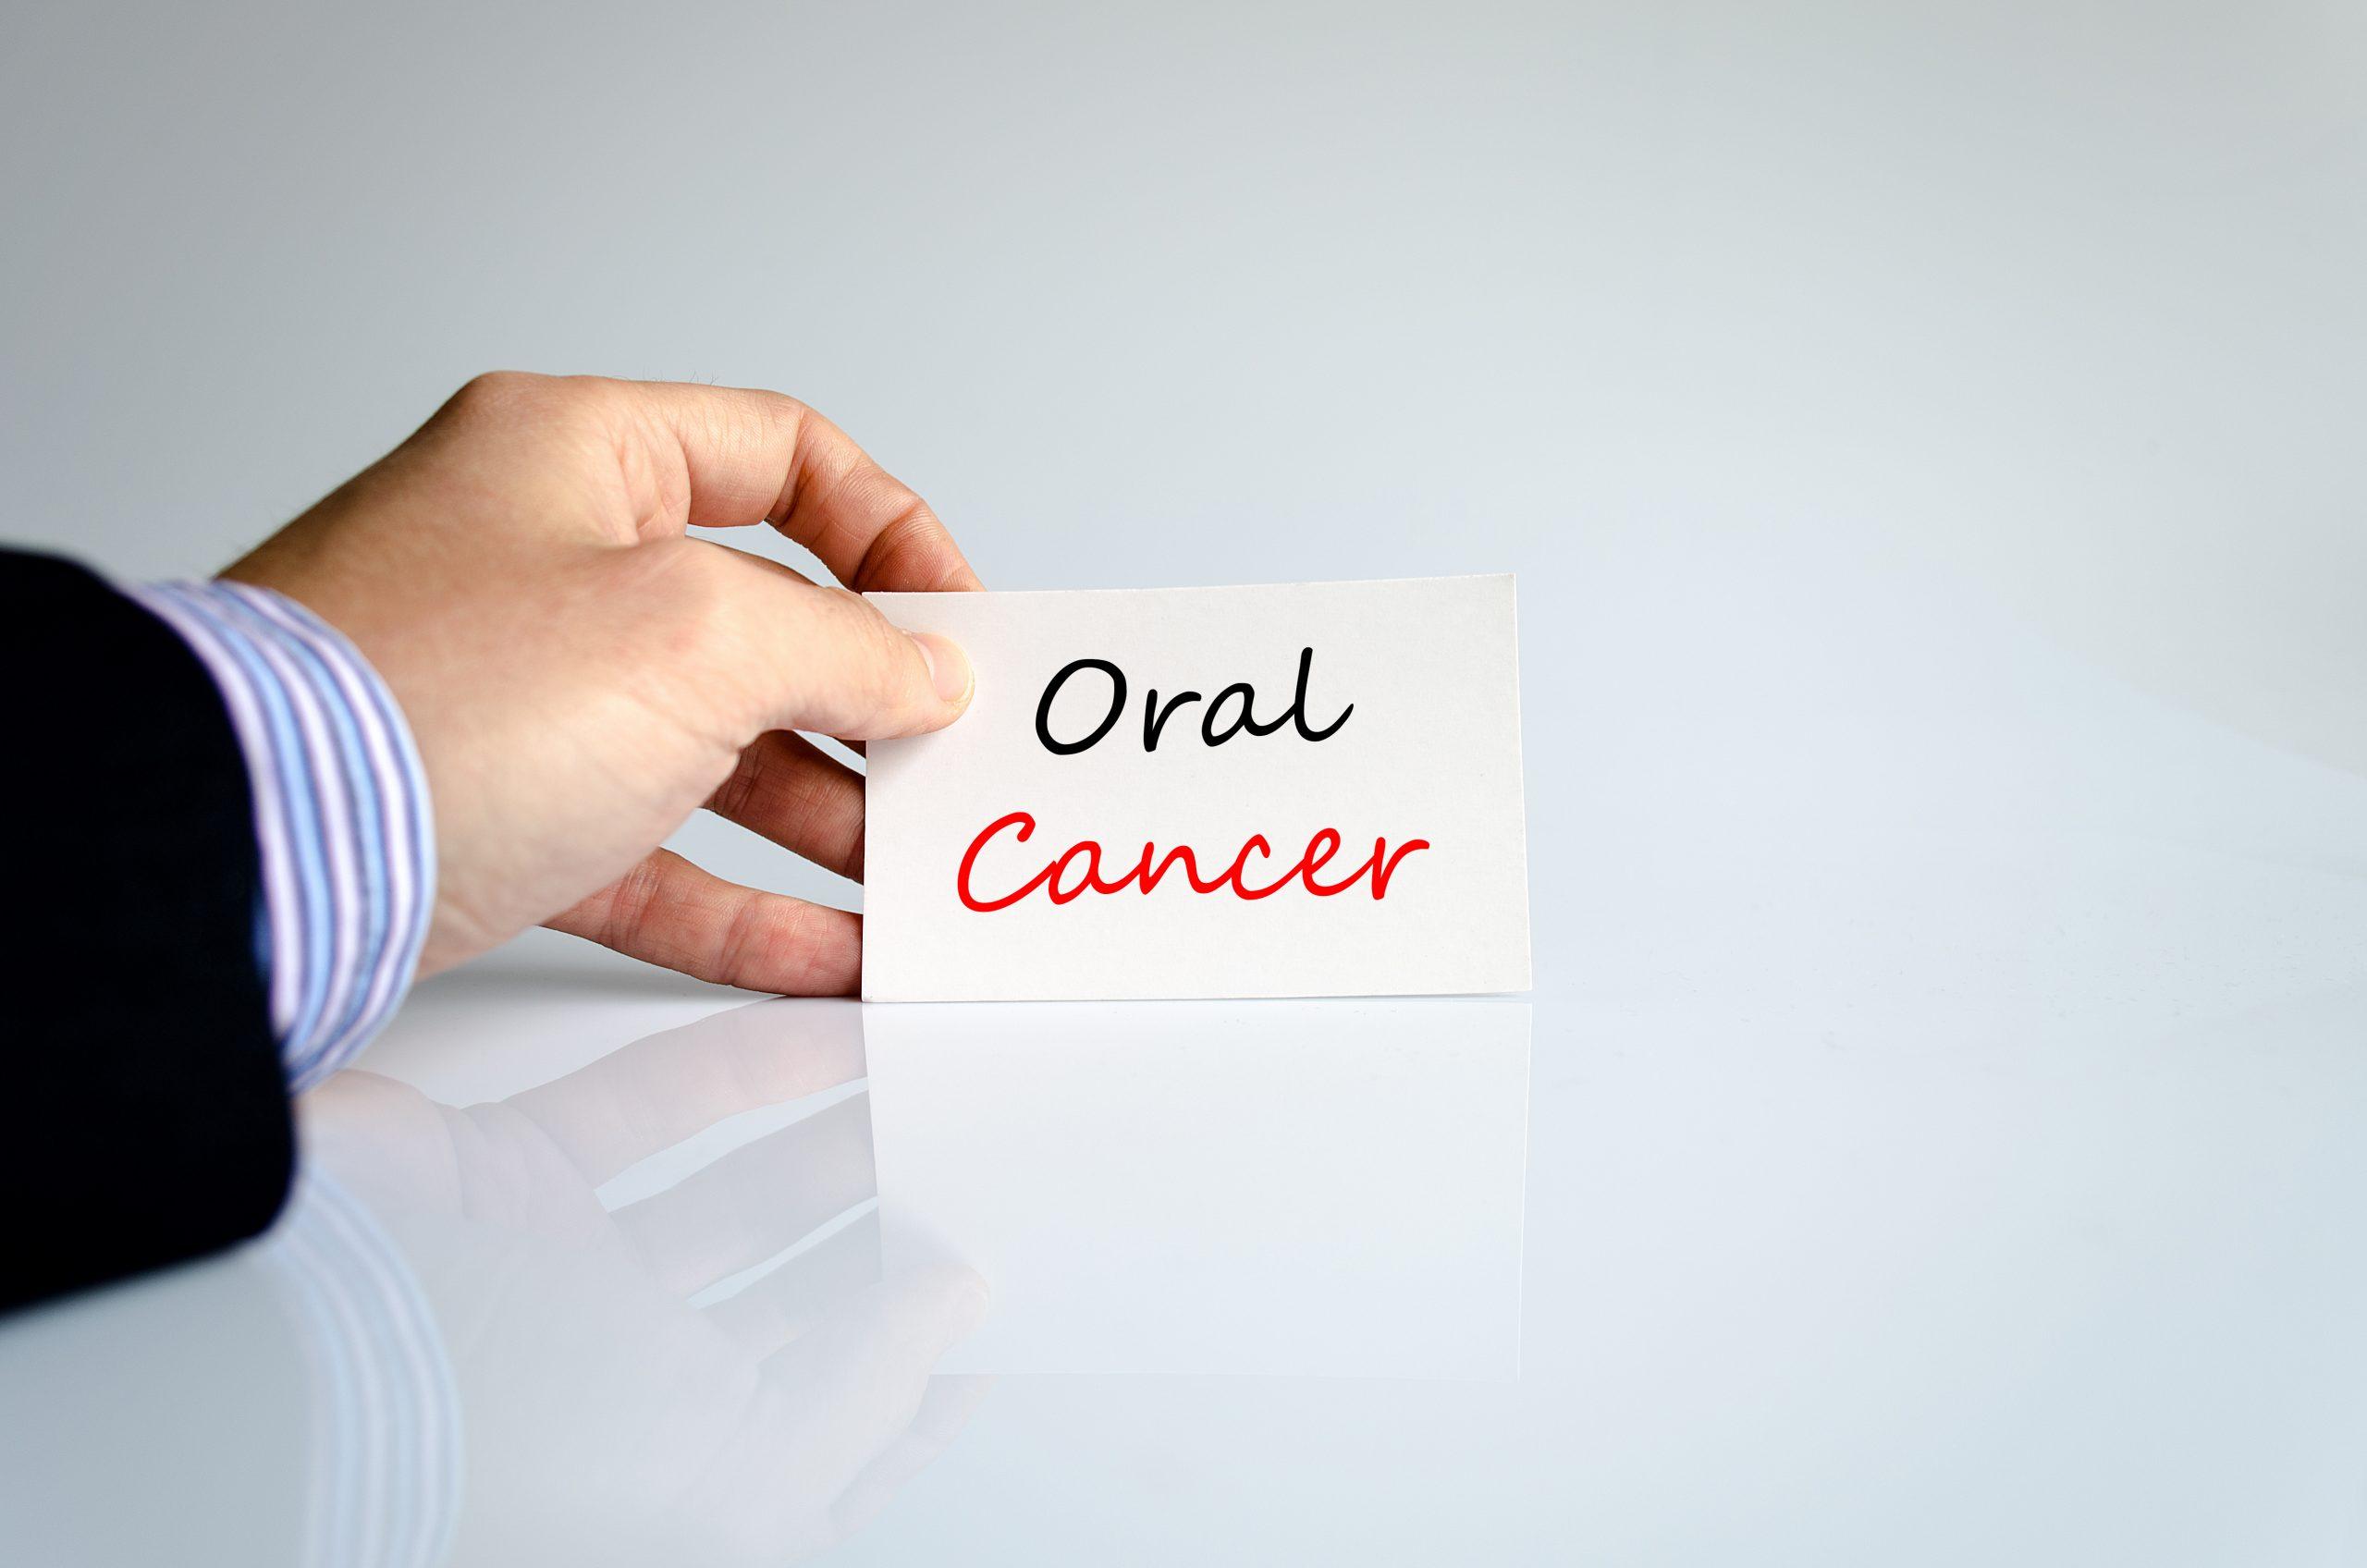 syosset oral cancer screening